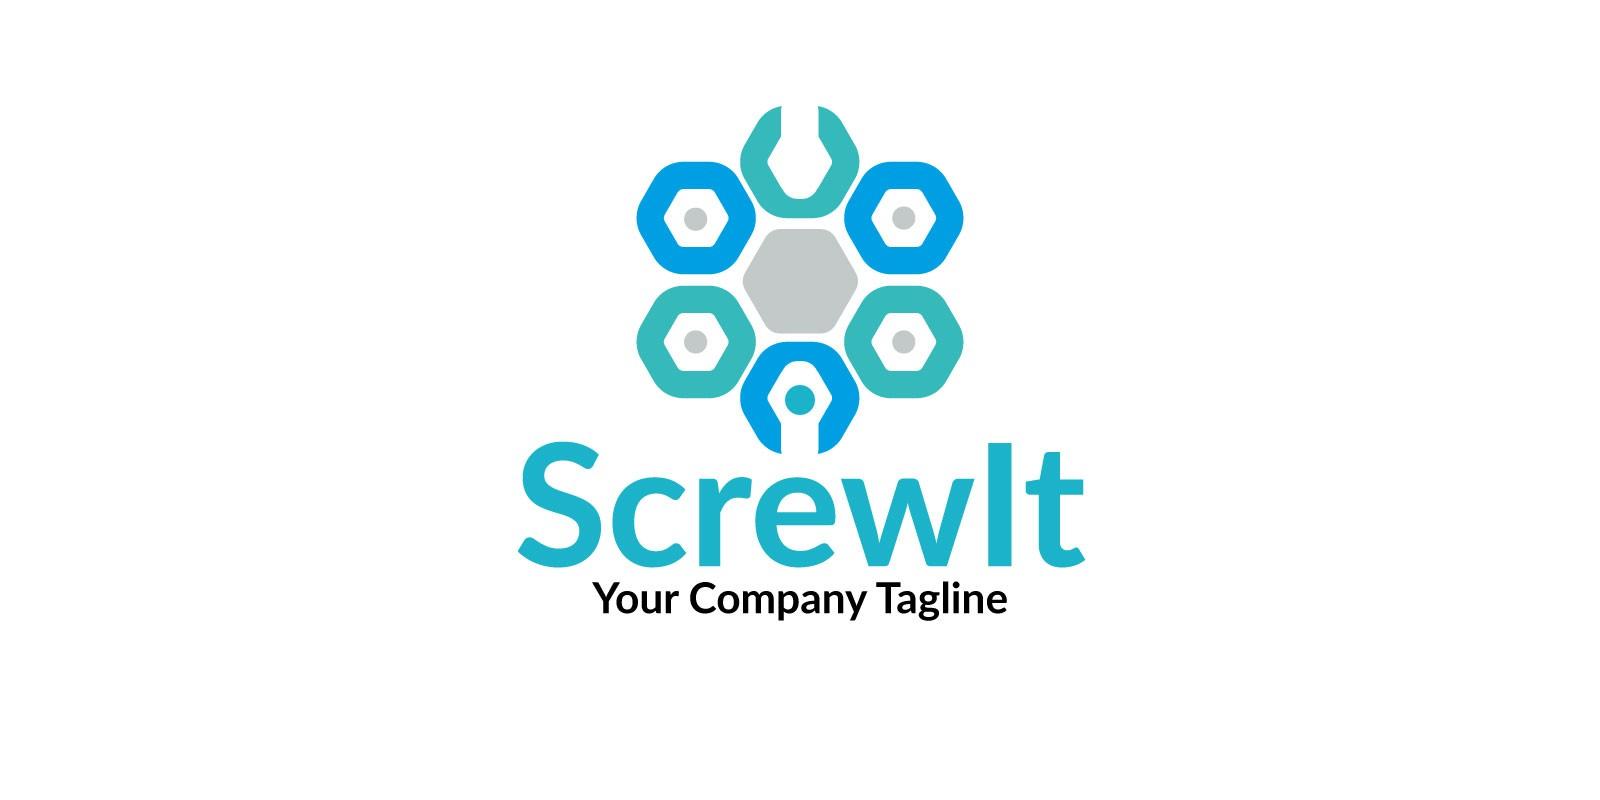 Screwit Mechanics Company Logo